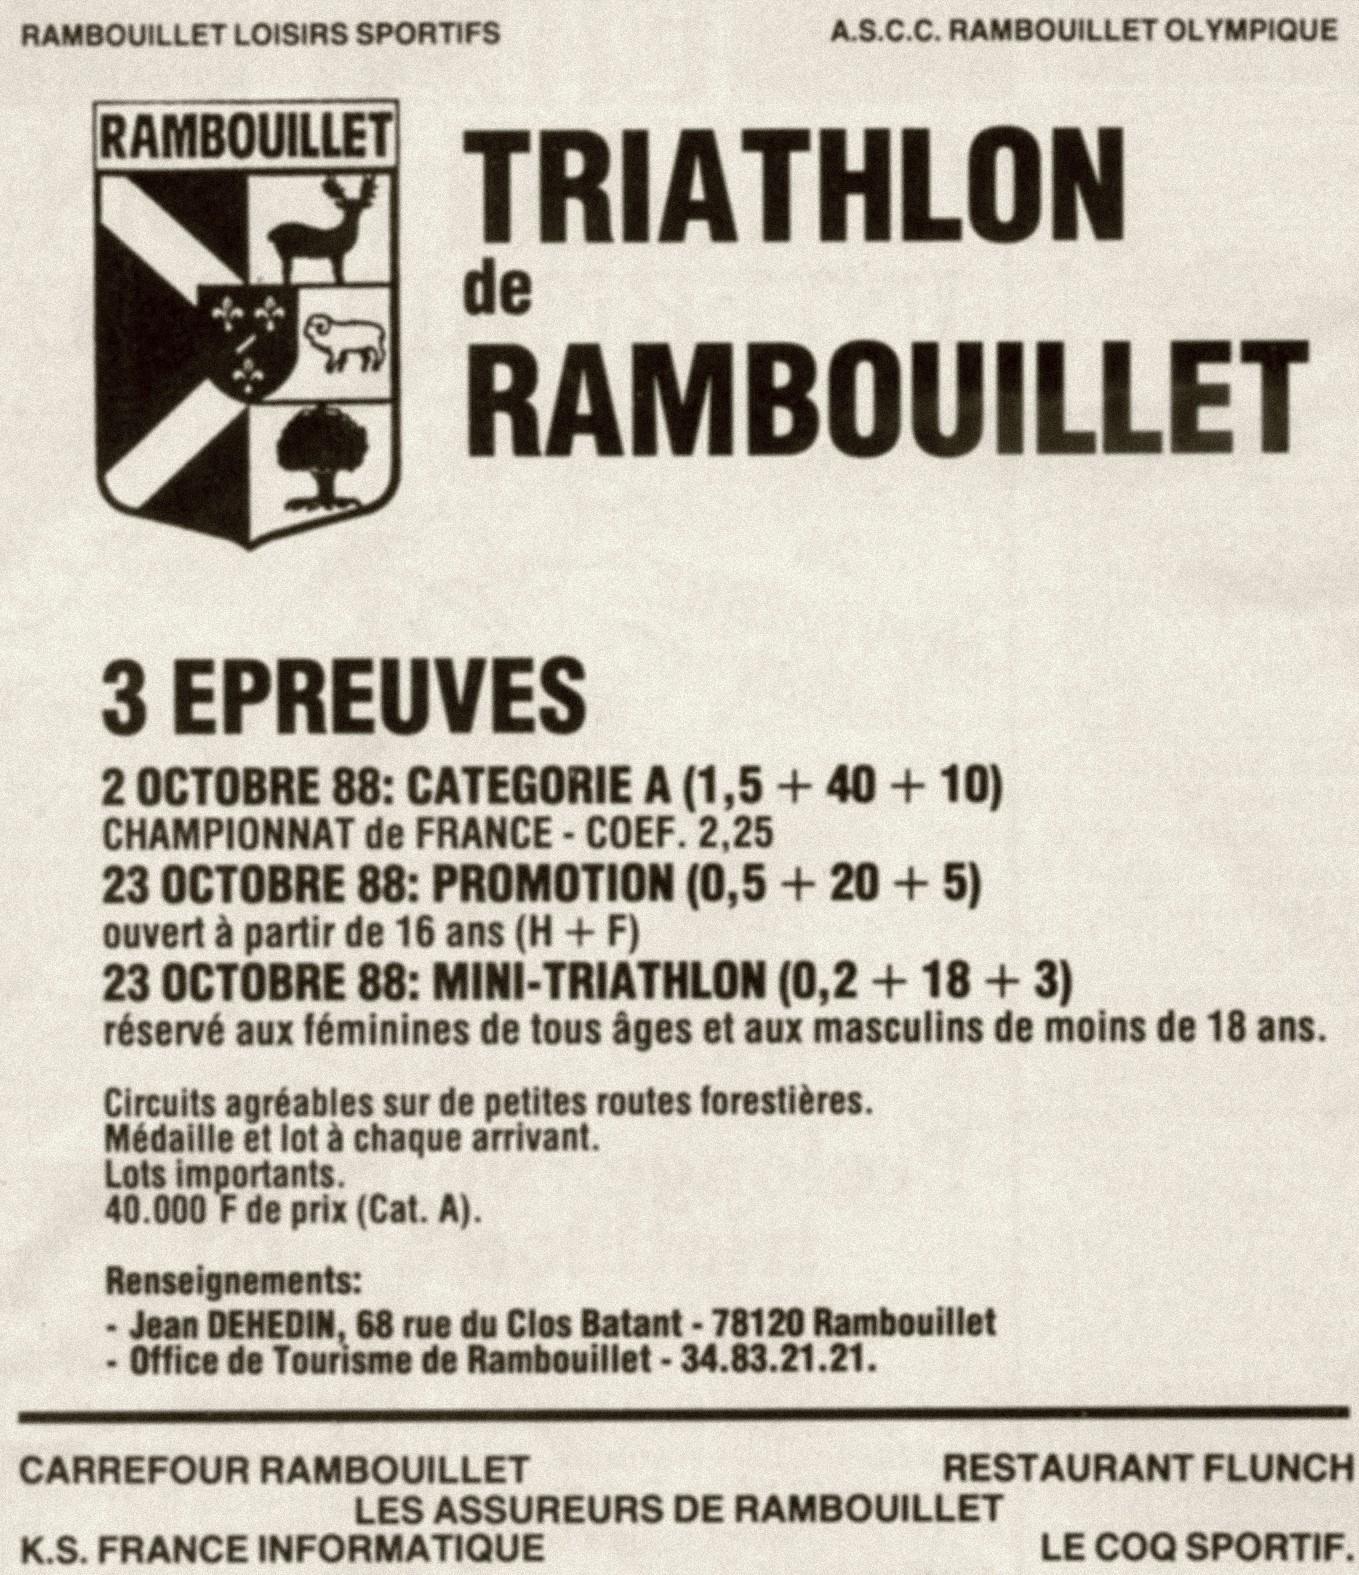 img[A]051_02-10-1988_rambouillet_pub